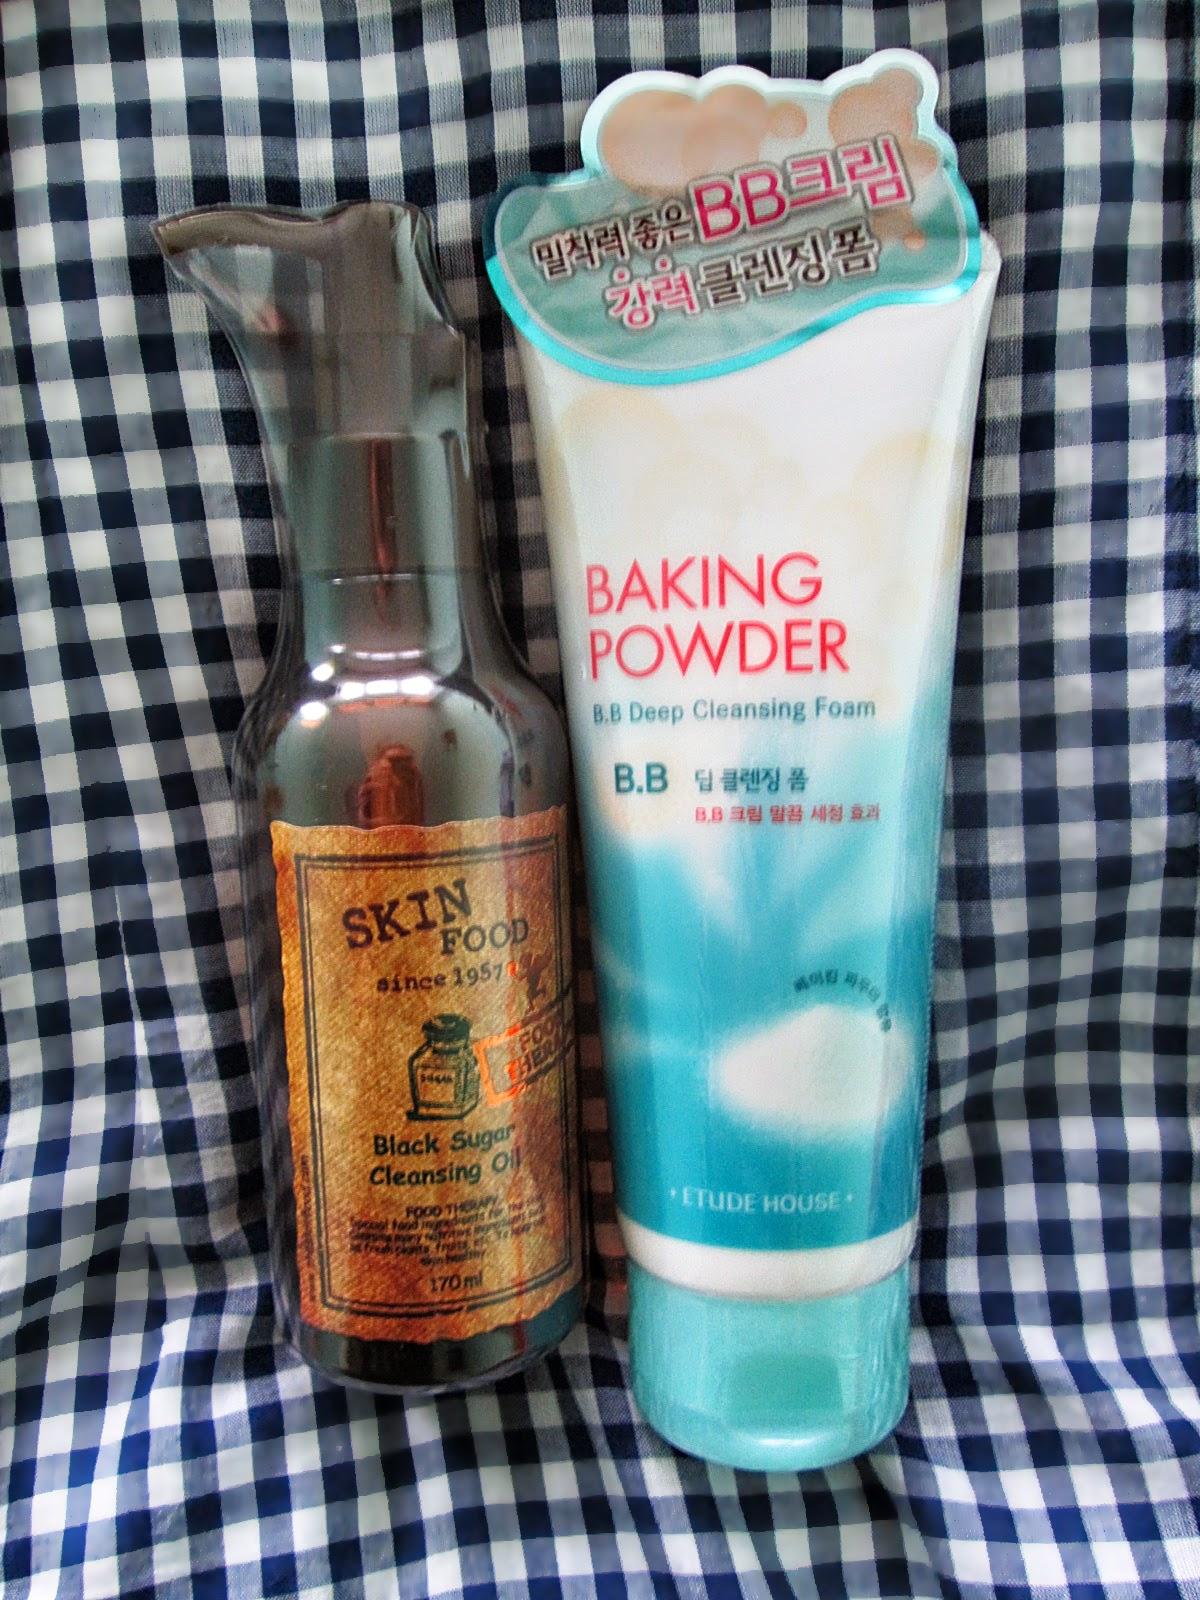 Etude House pianka baking powder, Skin Food olejek do mycia twarzy